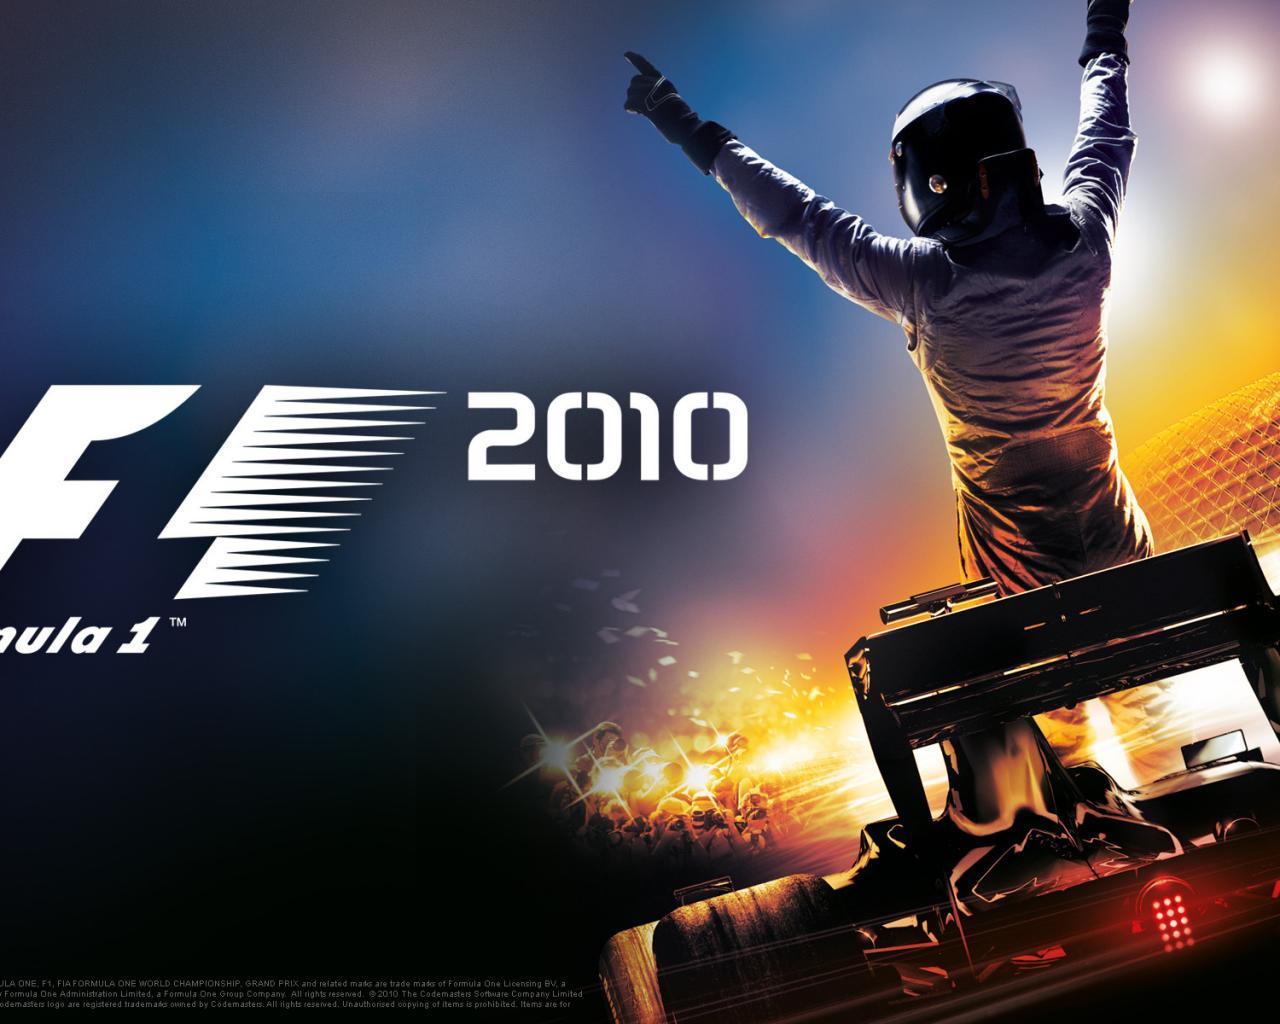 2010 спорт formula 1 гонки пилот формула 1